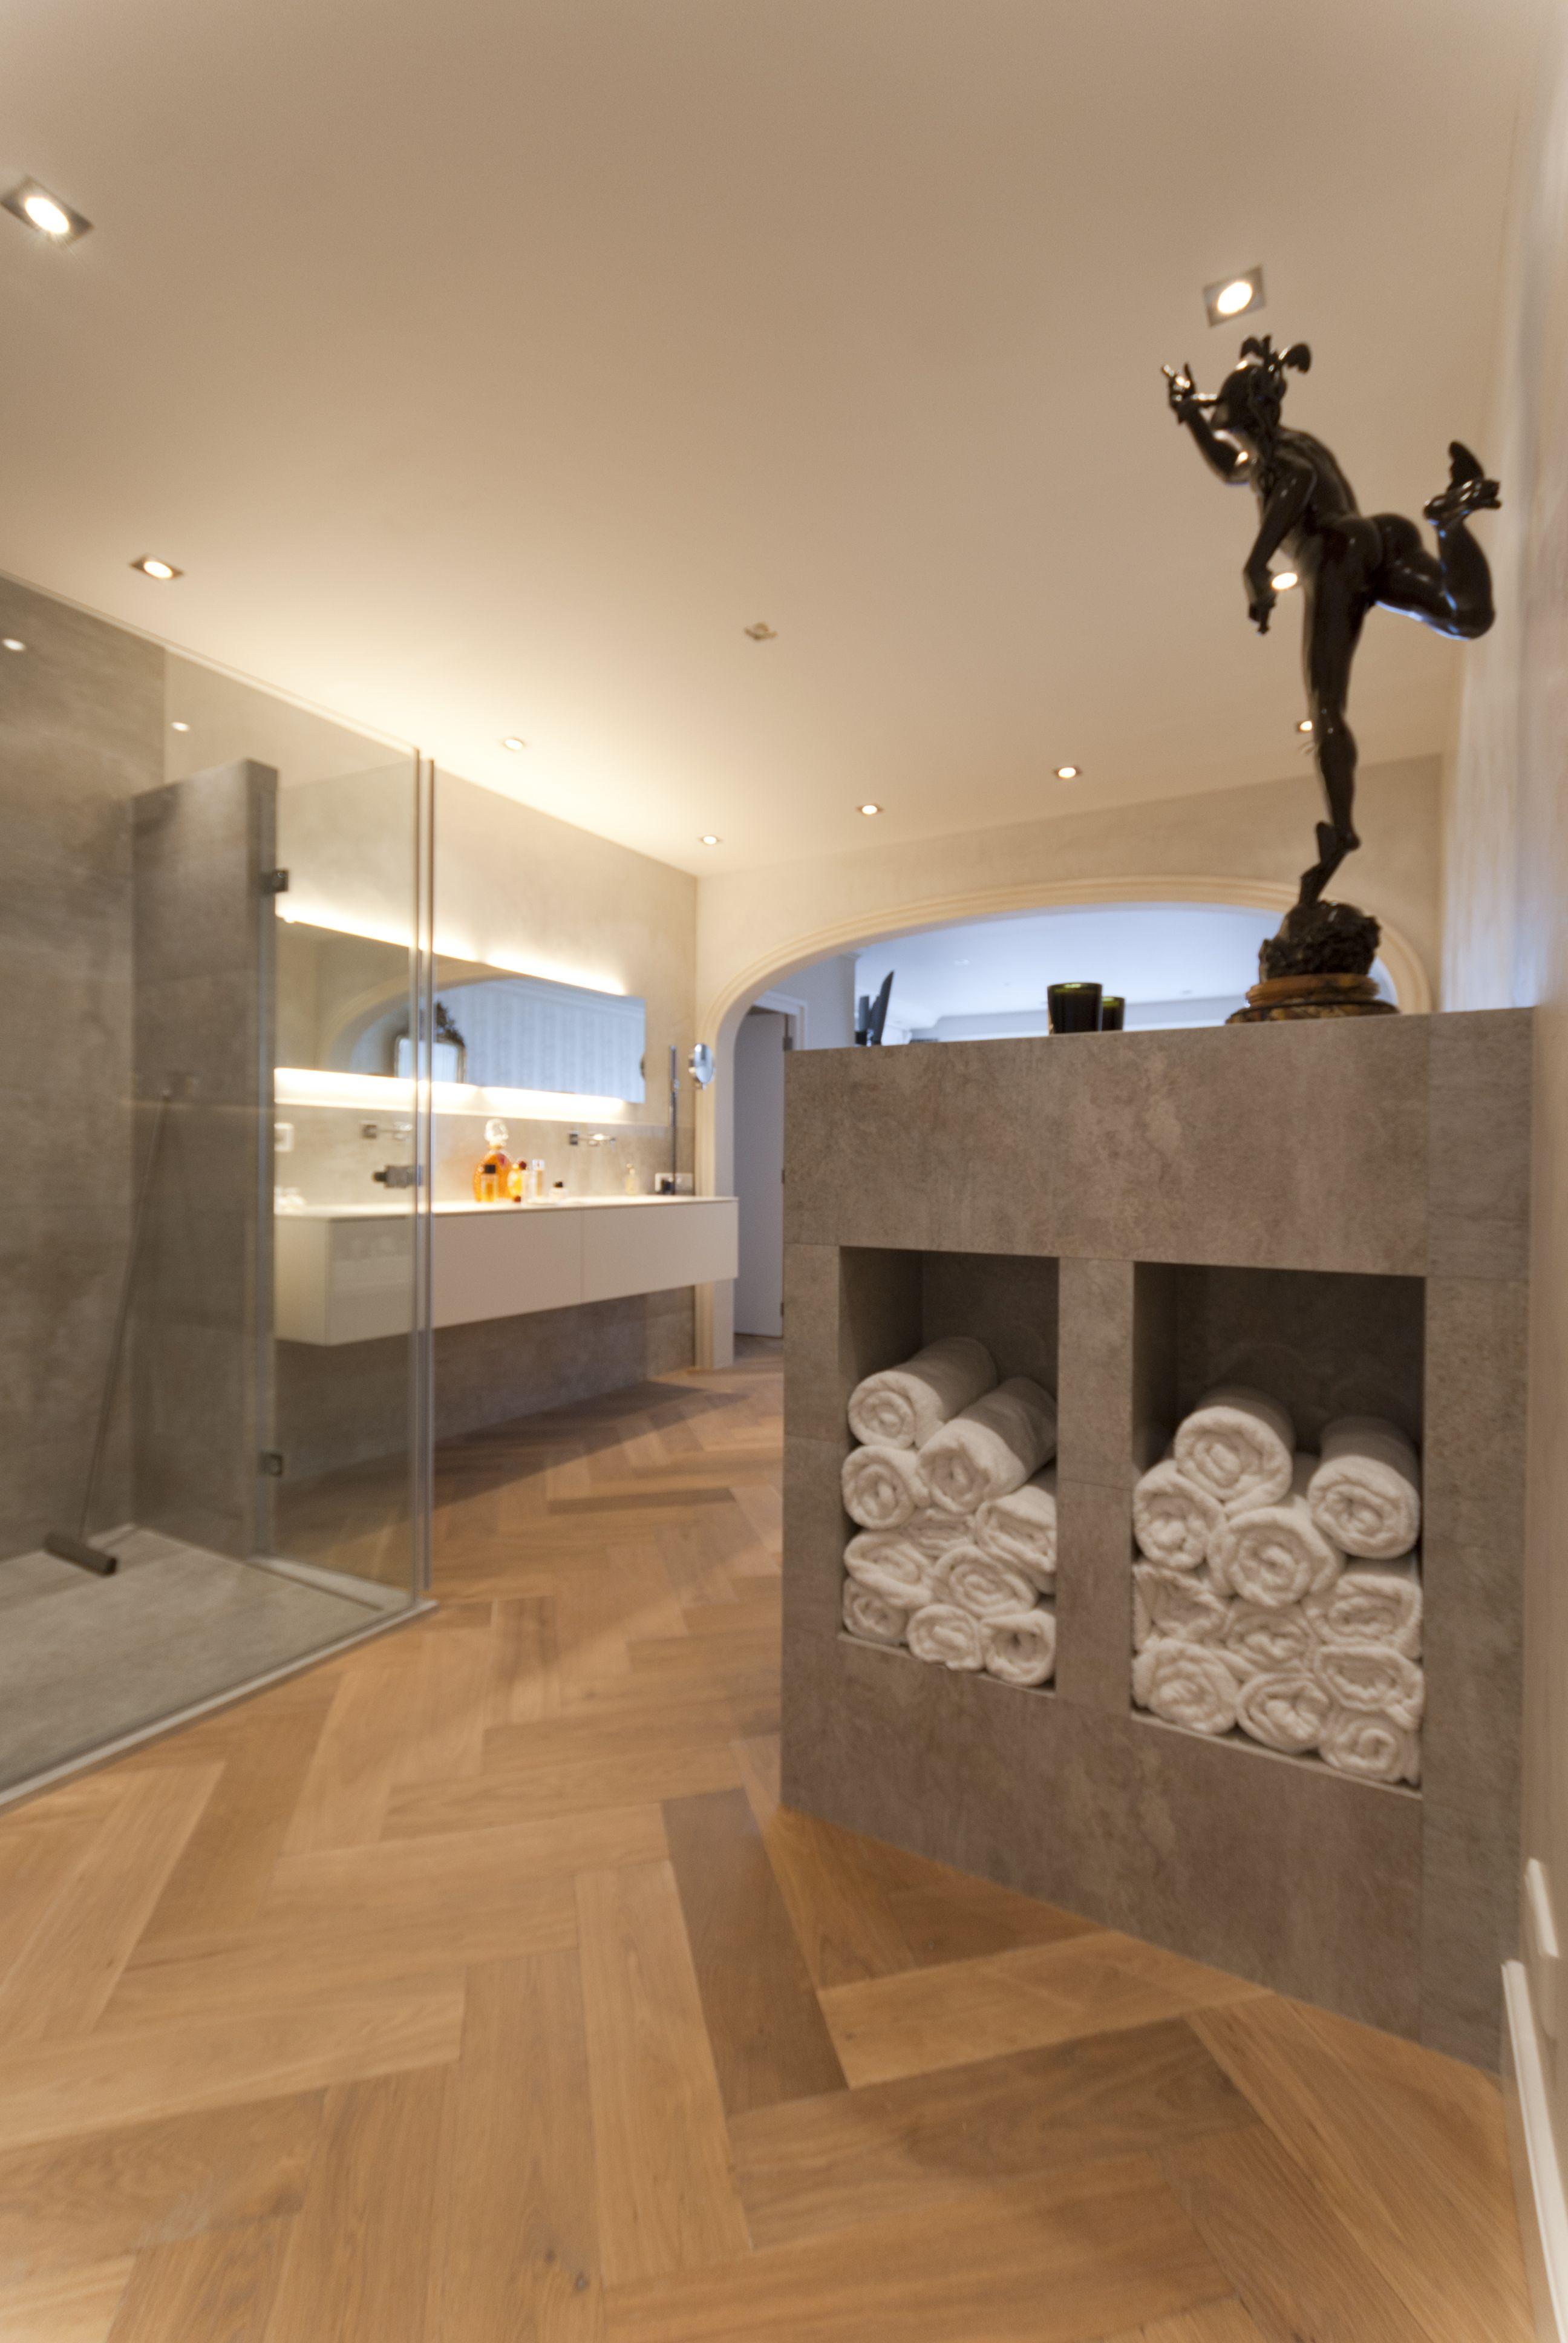 2 grote nissen tbv handdoeken made by tegelhuis badkamers en